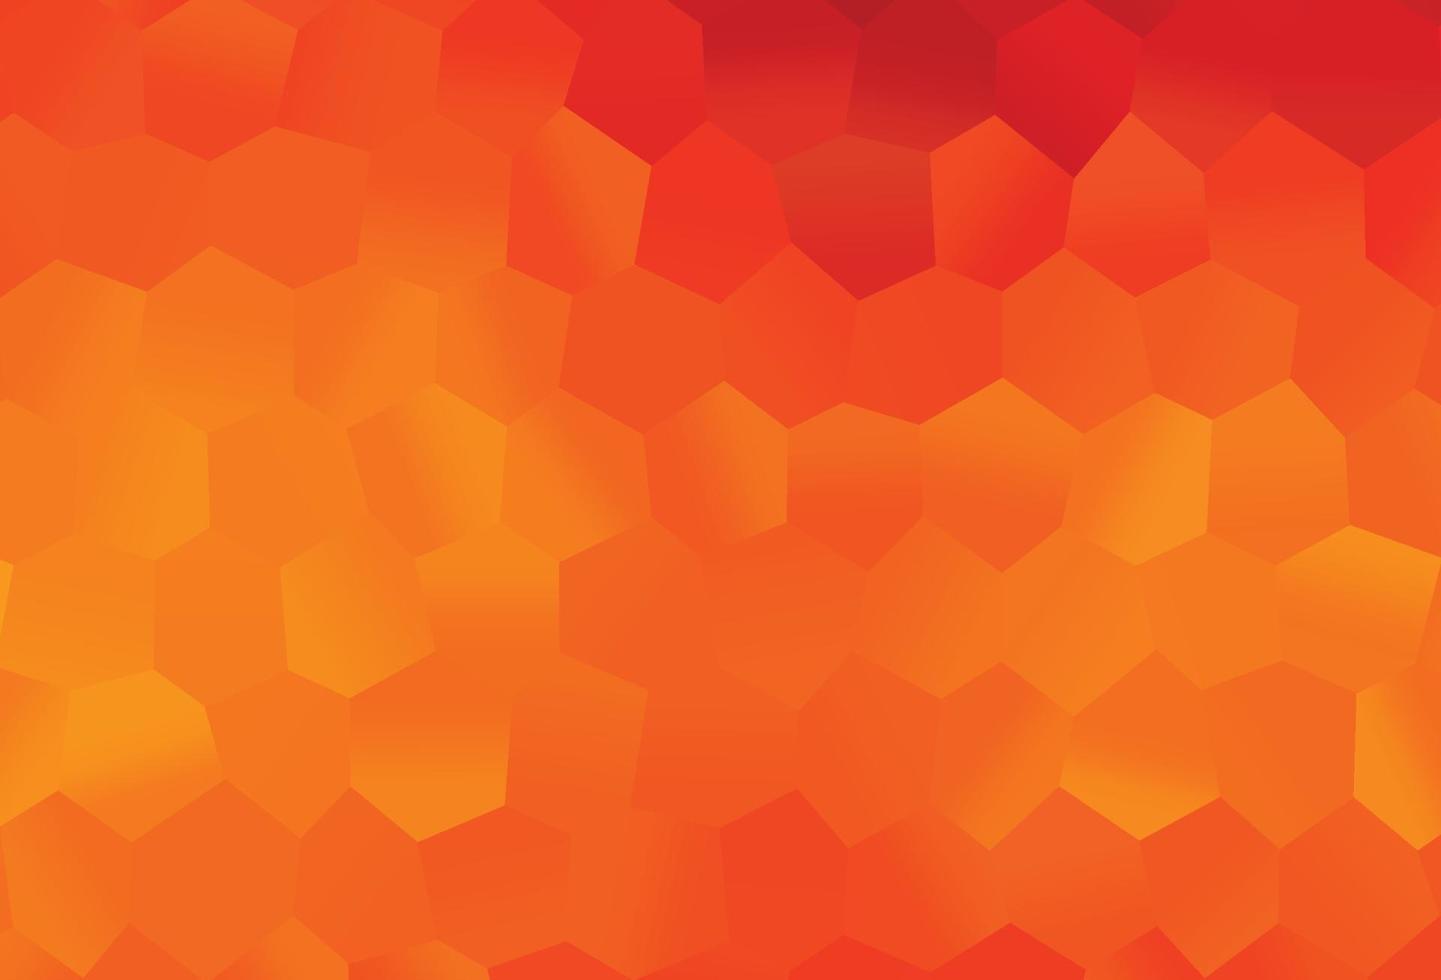 pano de fundo vector laranja claro com hexágonos.